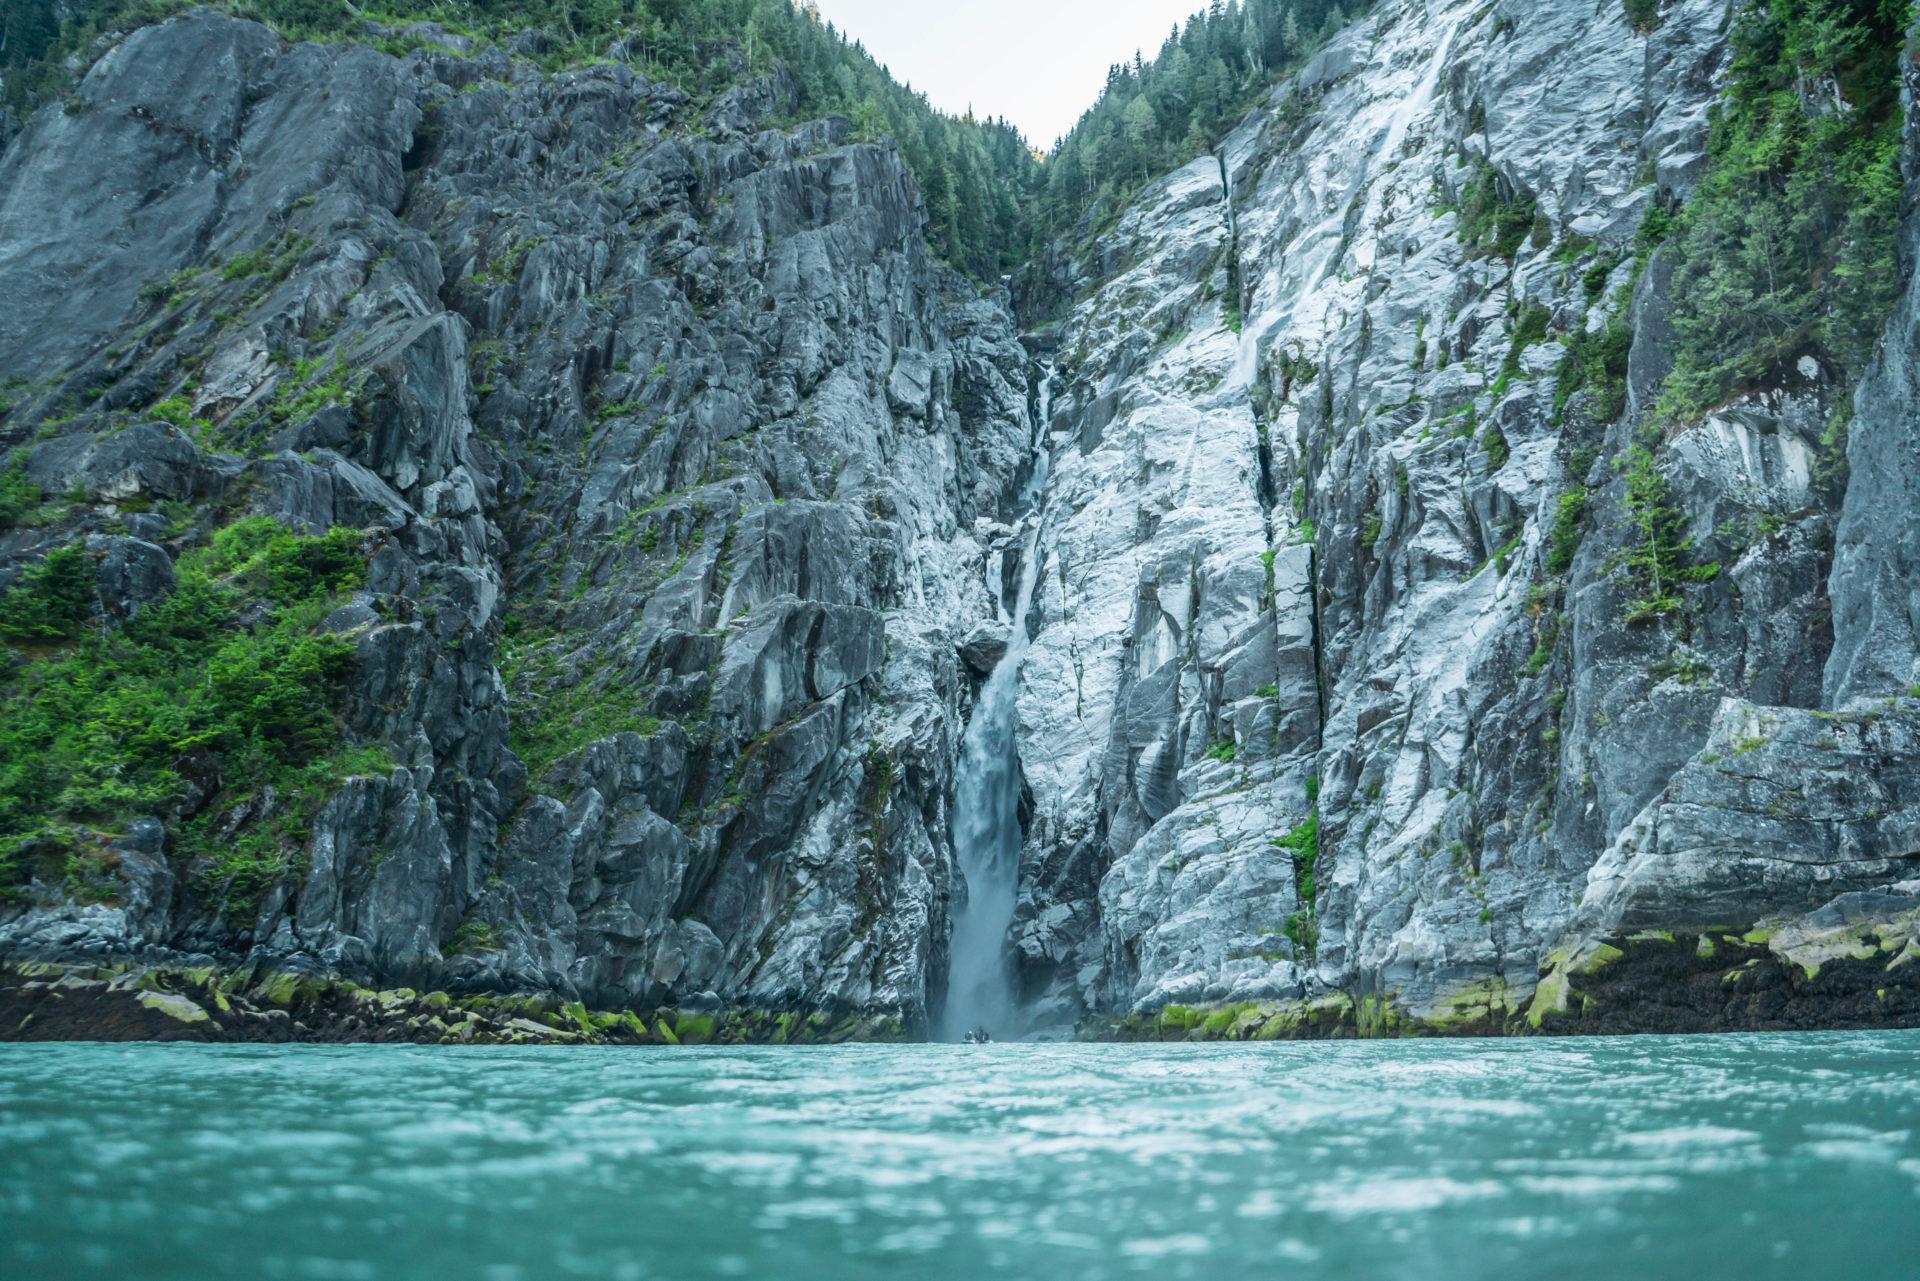 Waterfall in Gardner Canal, British Columbia